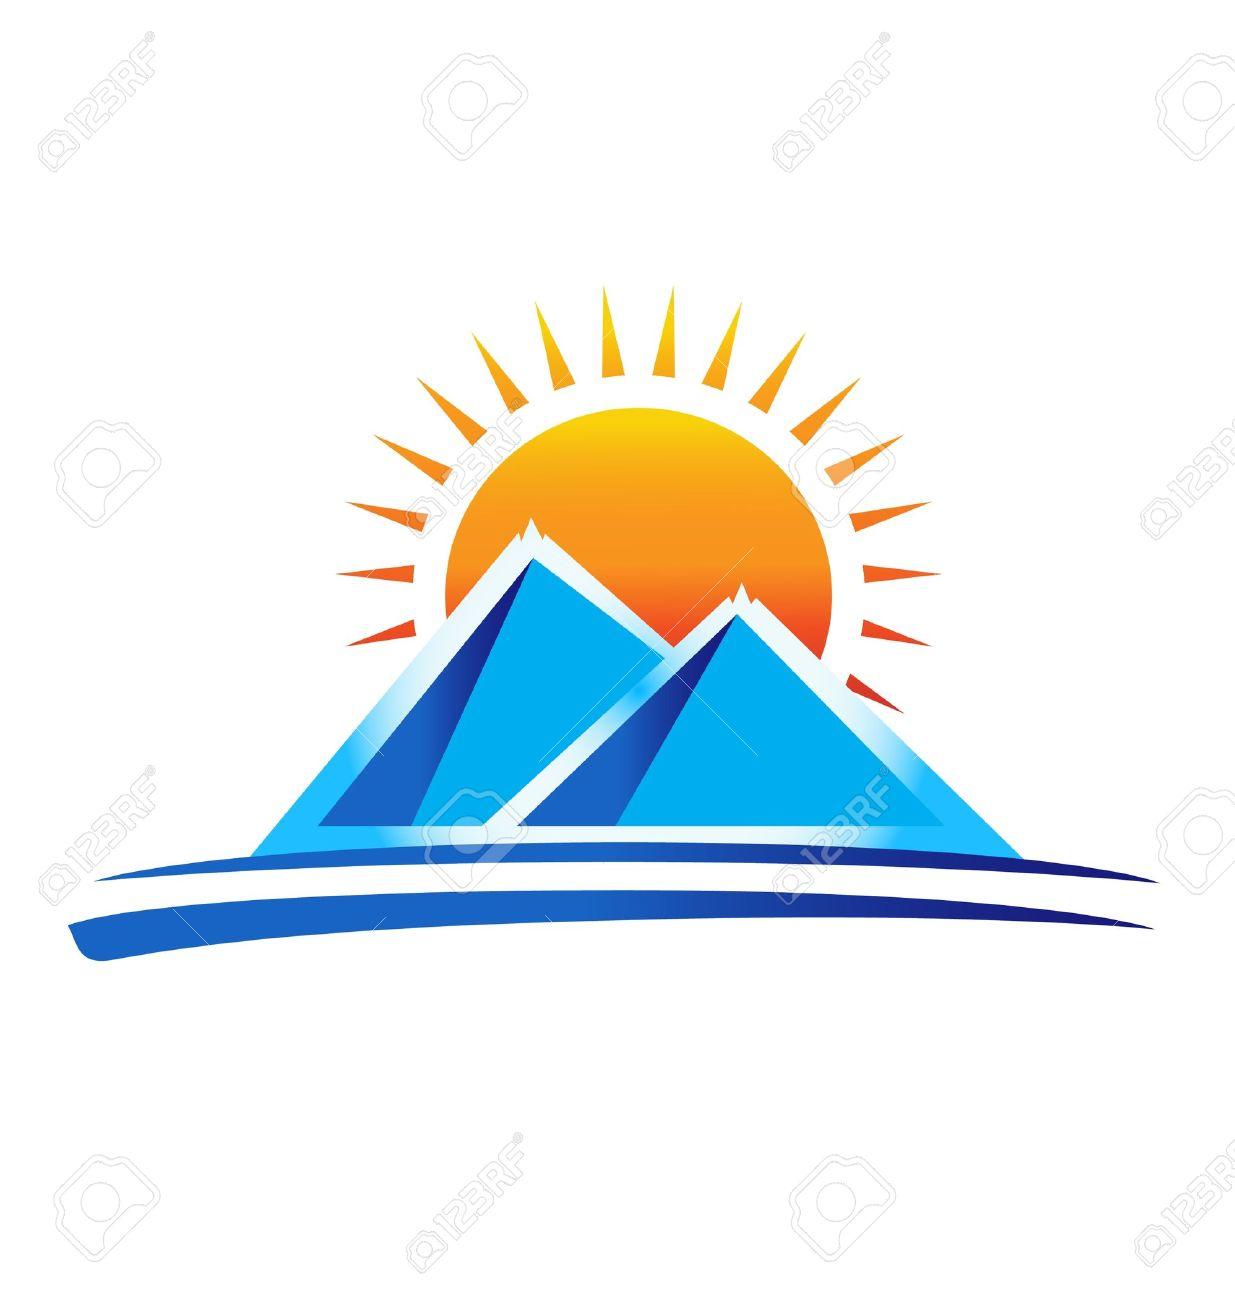 Sun And Mountain Clipart.